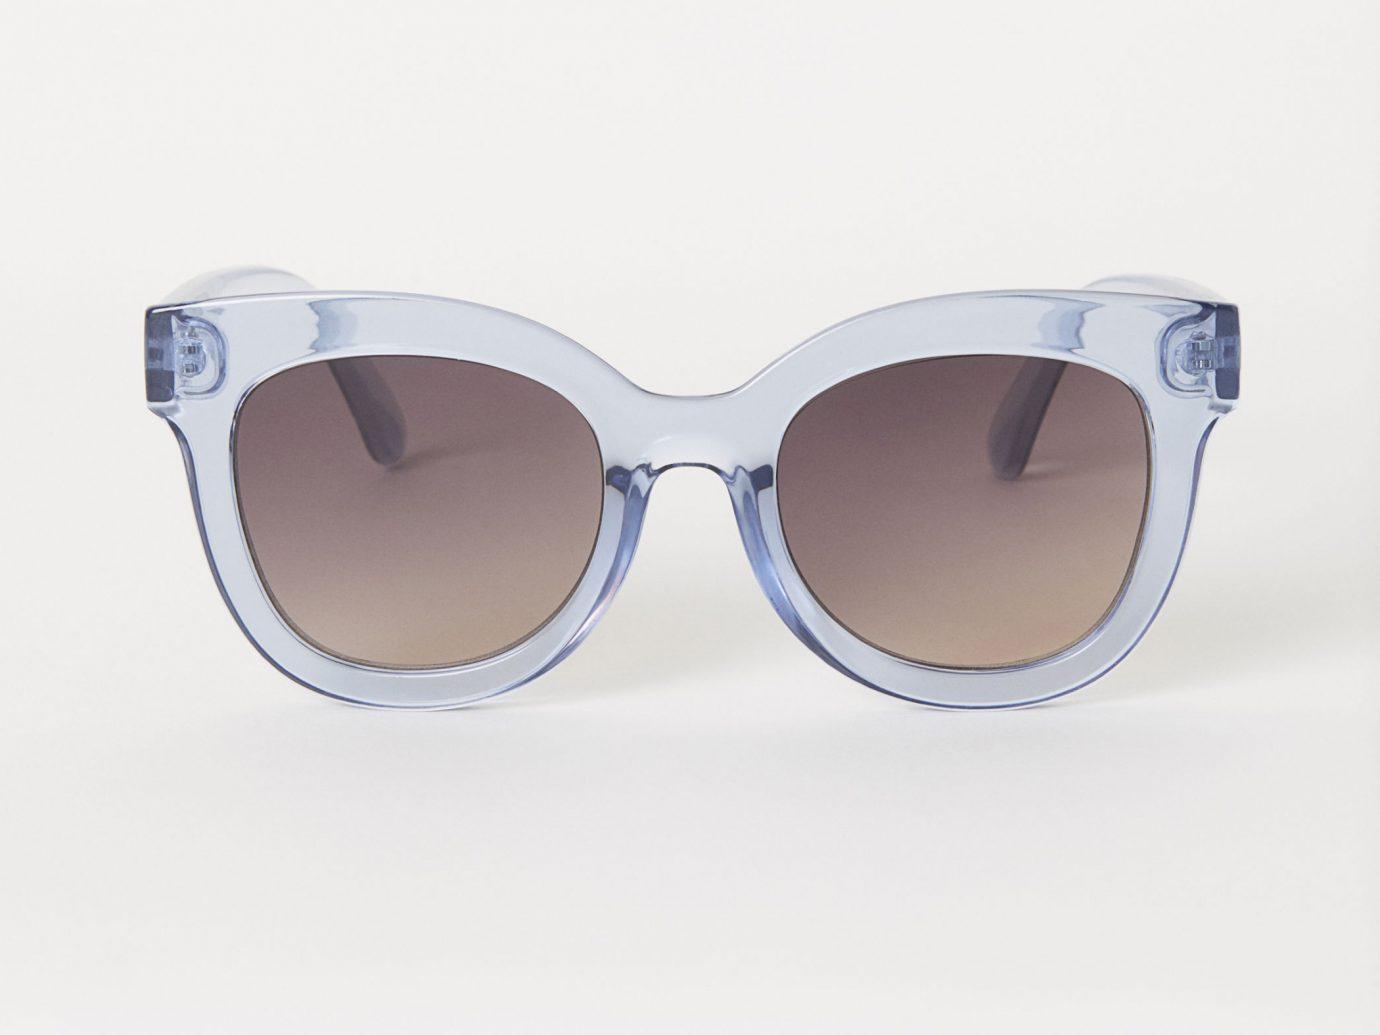 H&M Light Blue Sunglasses